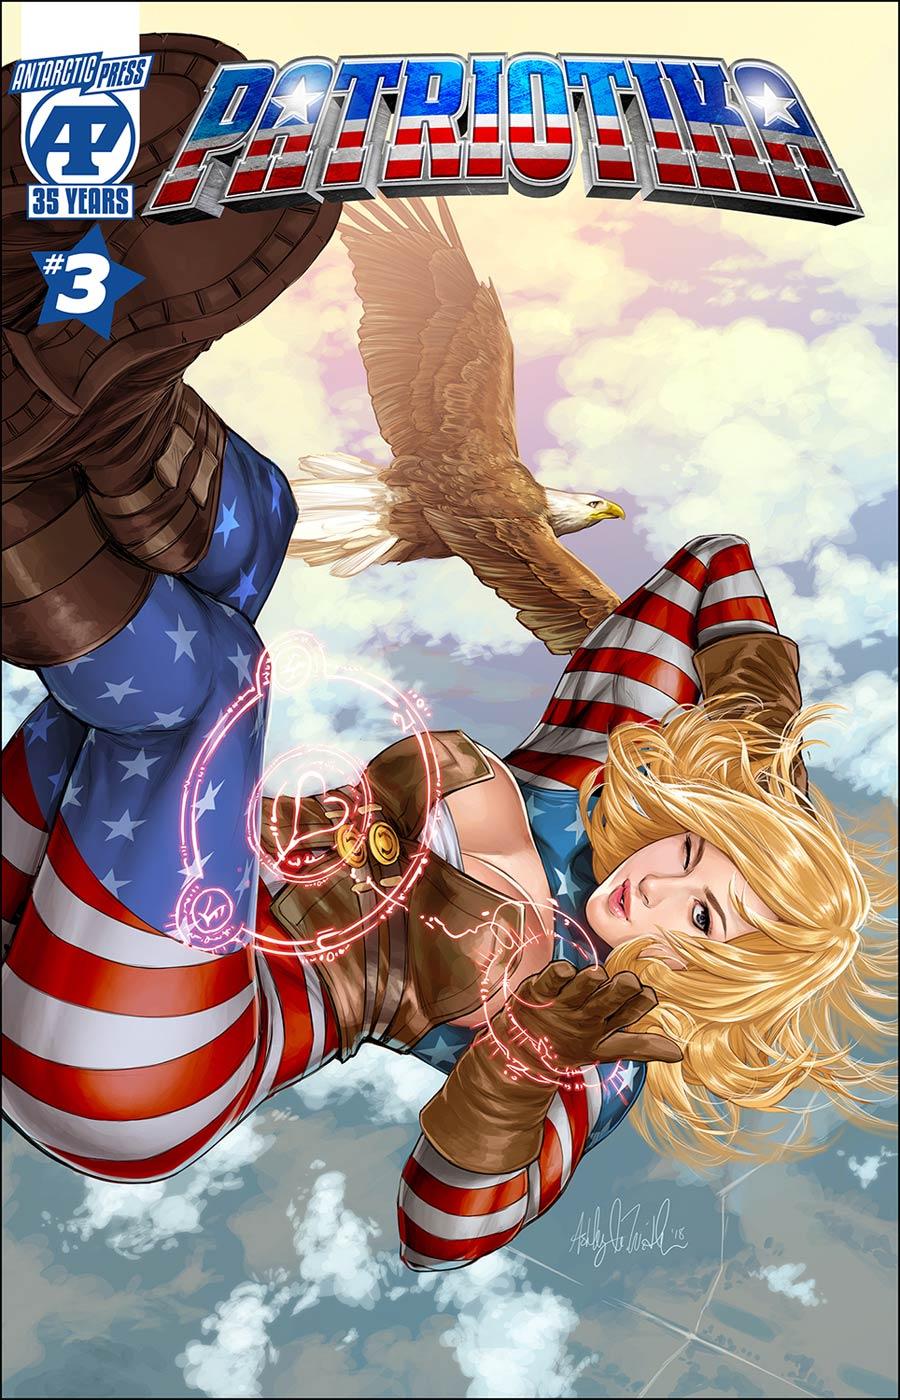 Patriotika #3 Cover A Regular Chuck Art Cover